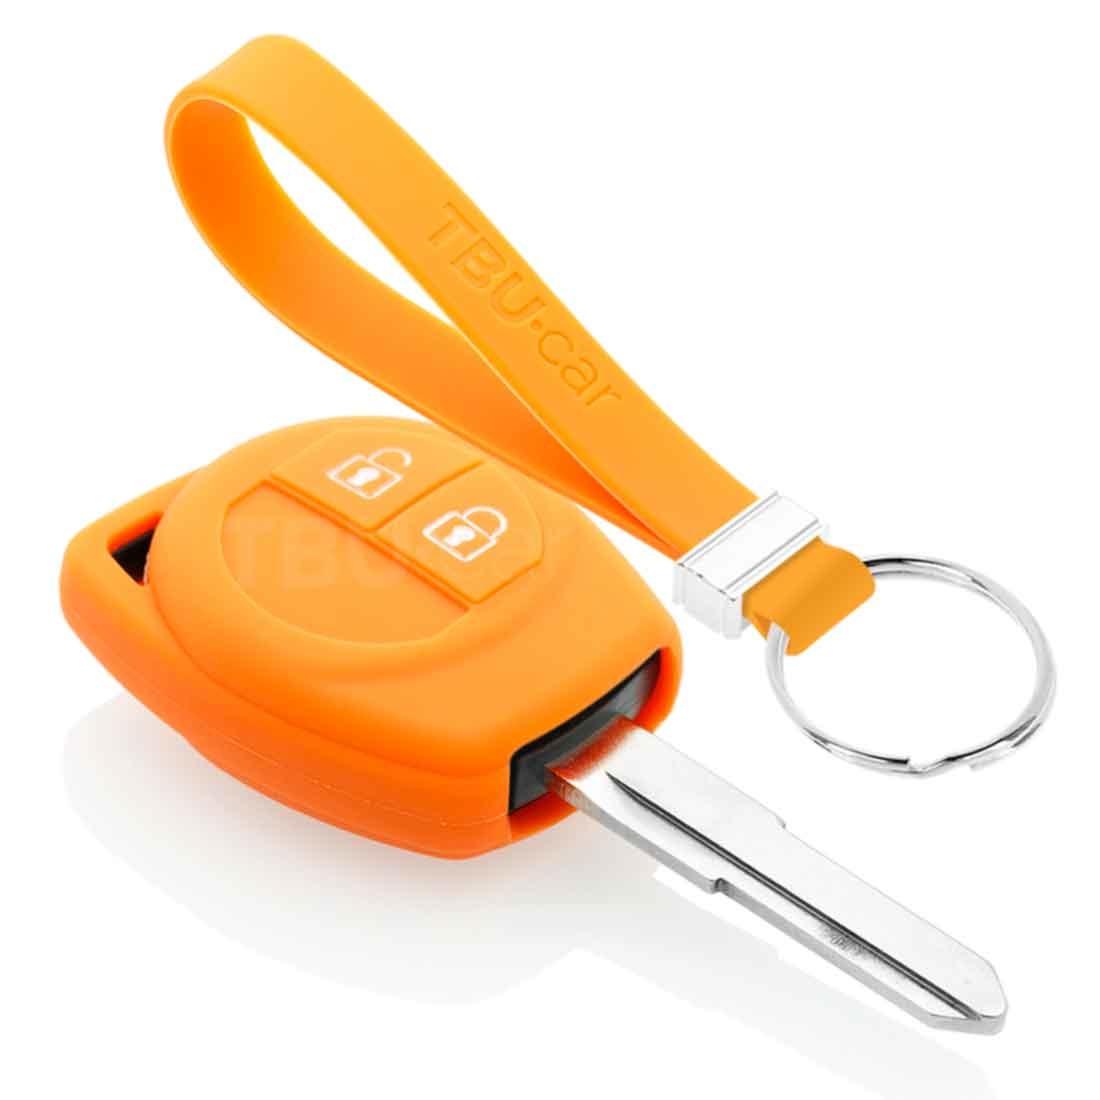 TBU car TBU car Sleutel cover compatibel met Suzuki - Silicone sleutelhoesje - beschermhoesje autosleutel - Oranje